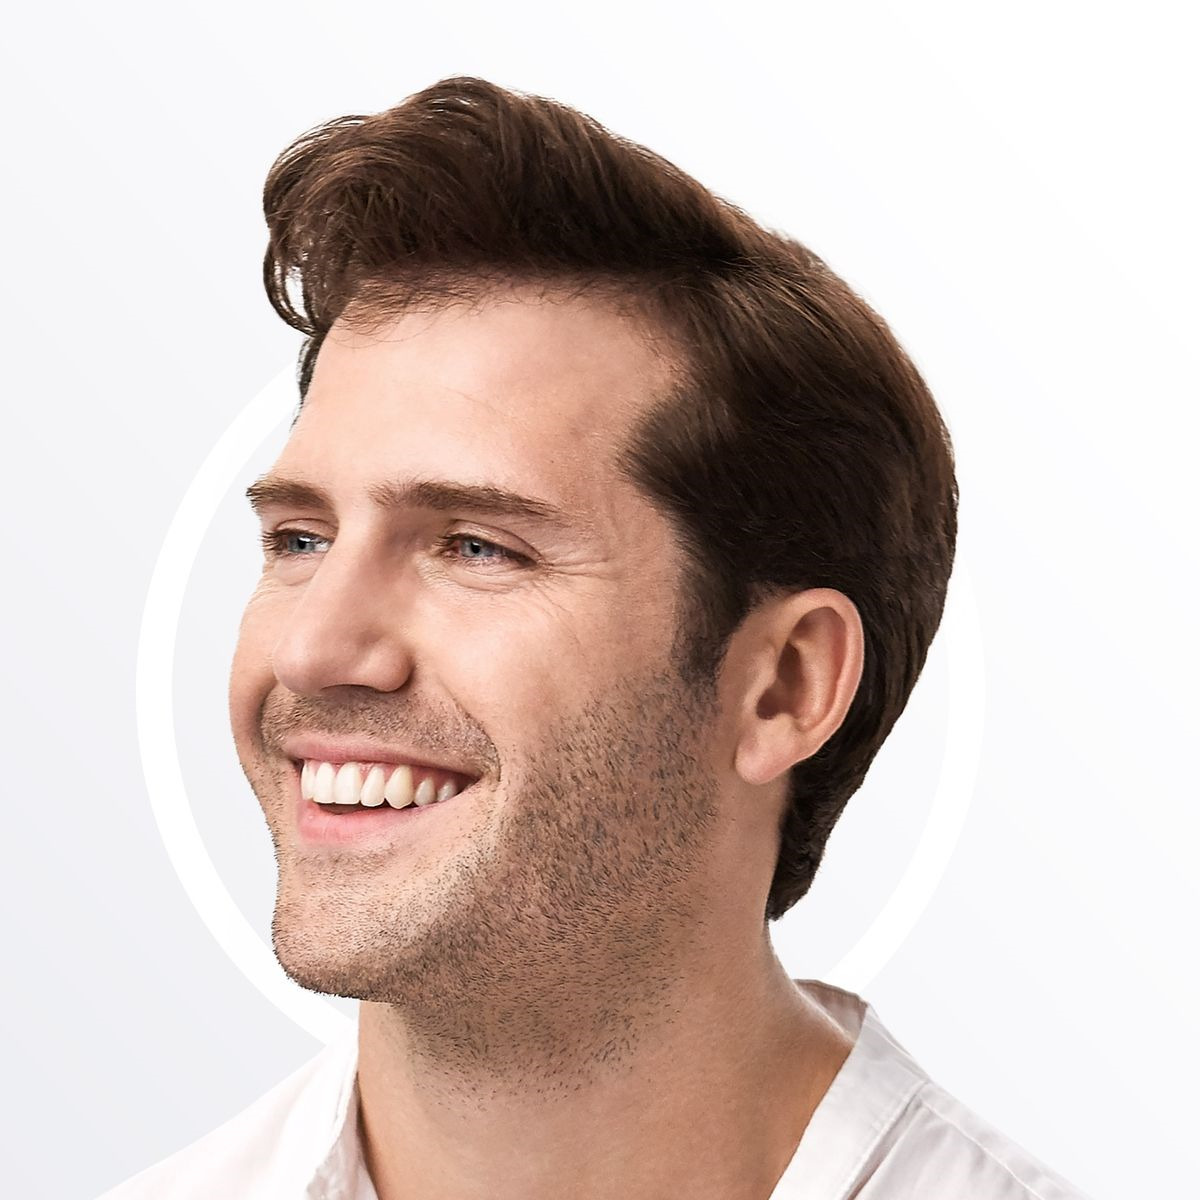 Nioxin IntensiveУсилитель роста волос Therapy Hair Booster 50 мл Nioxin